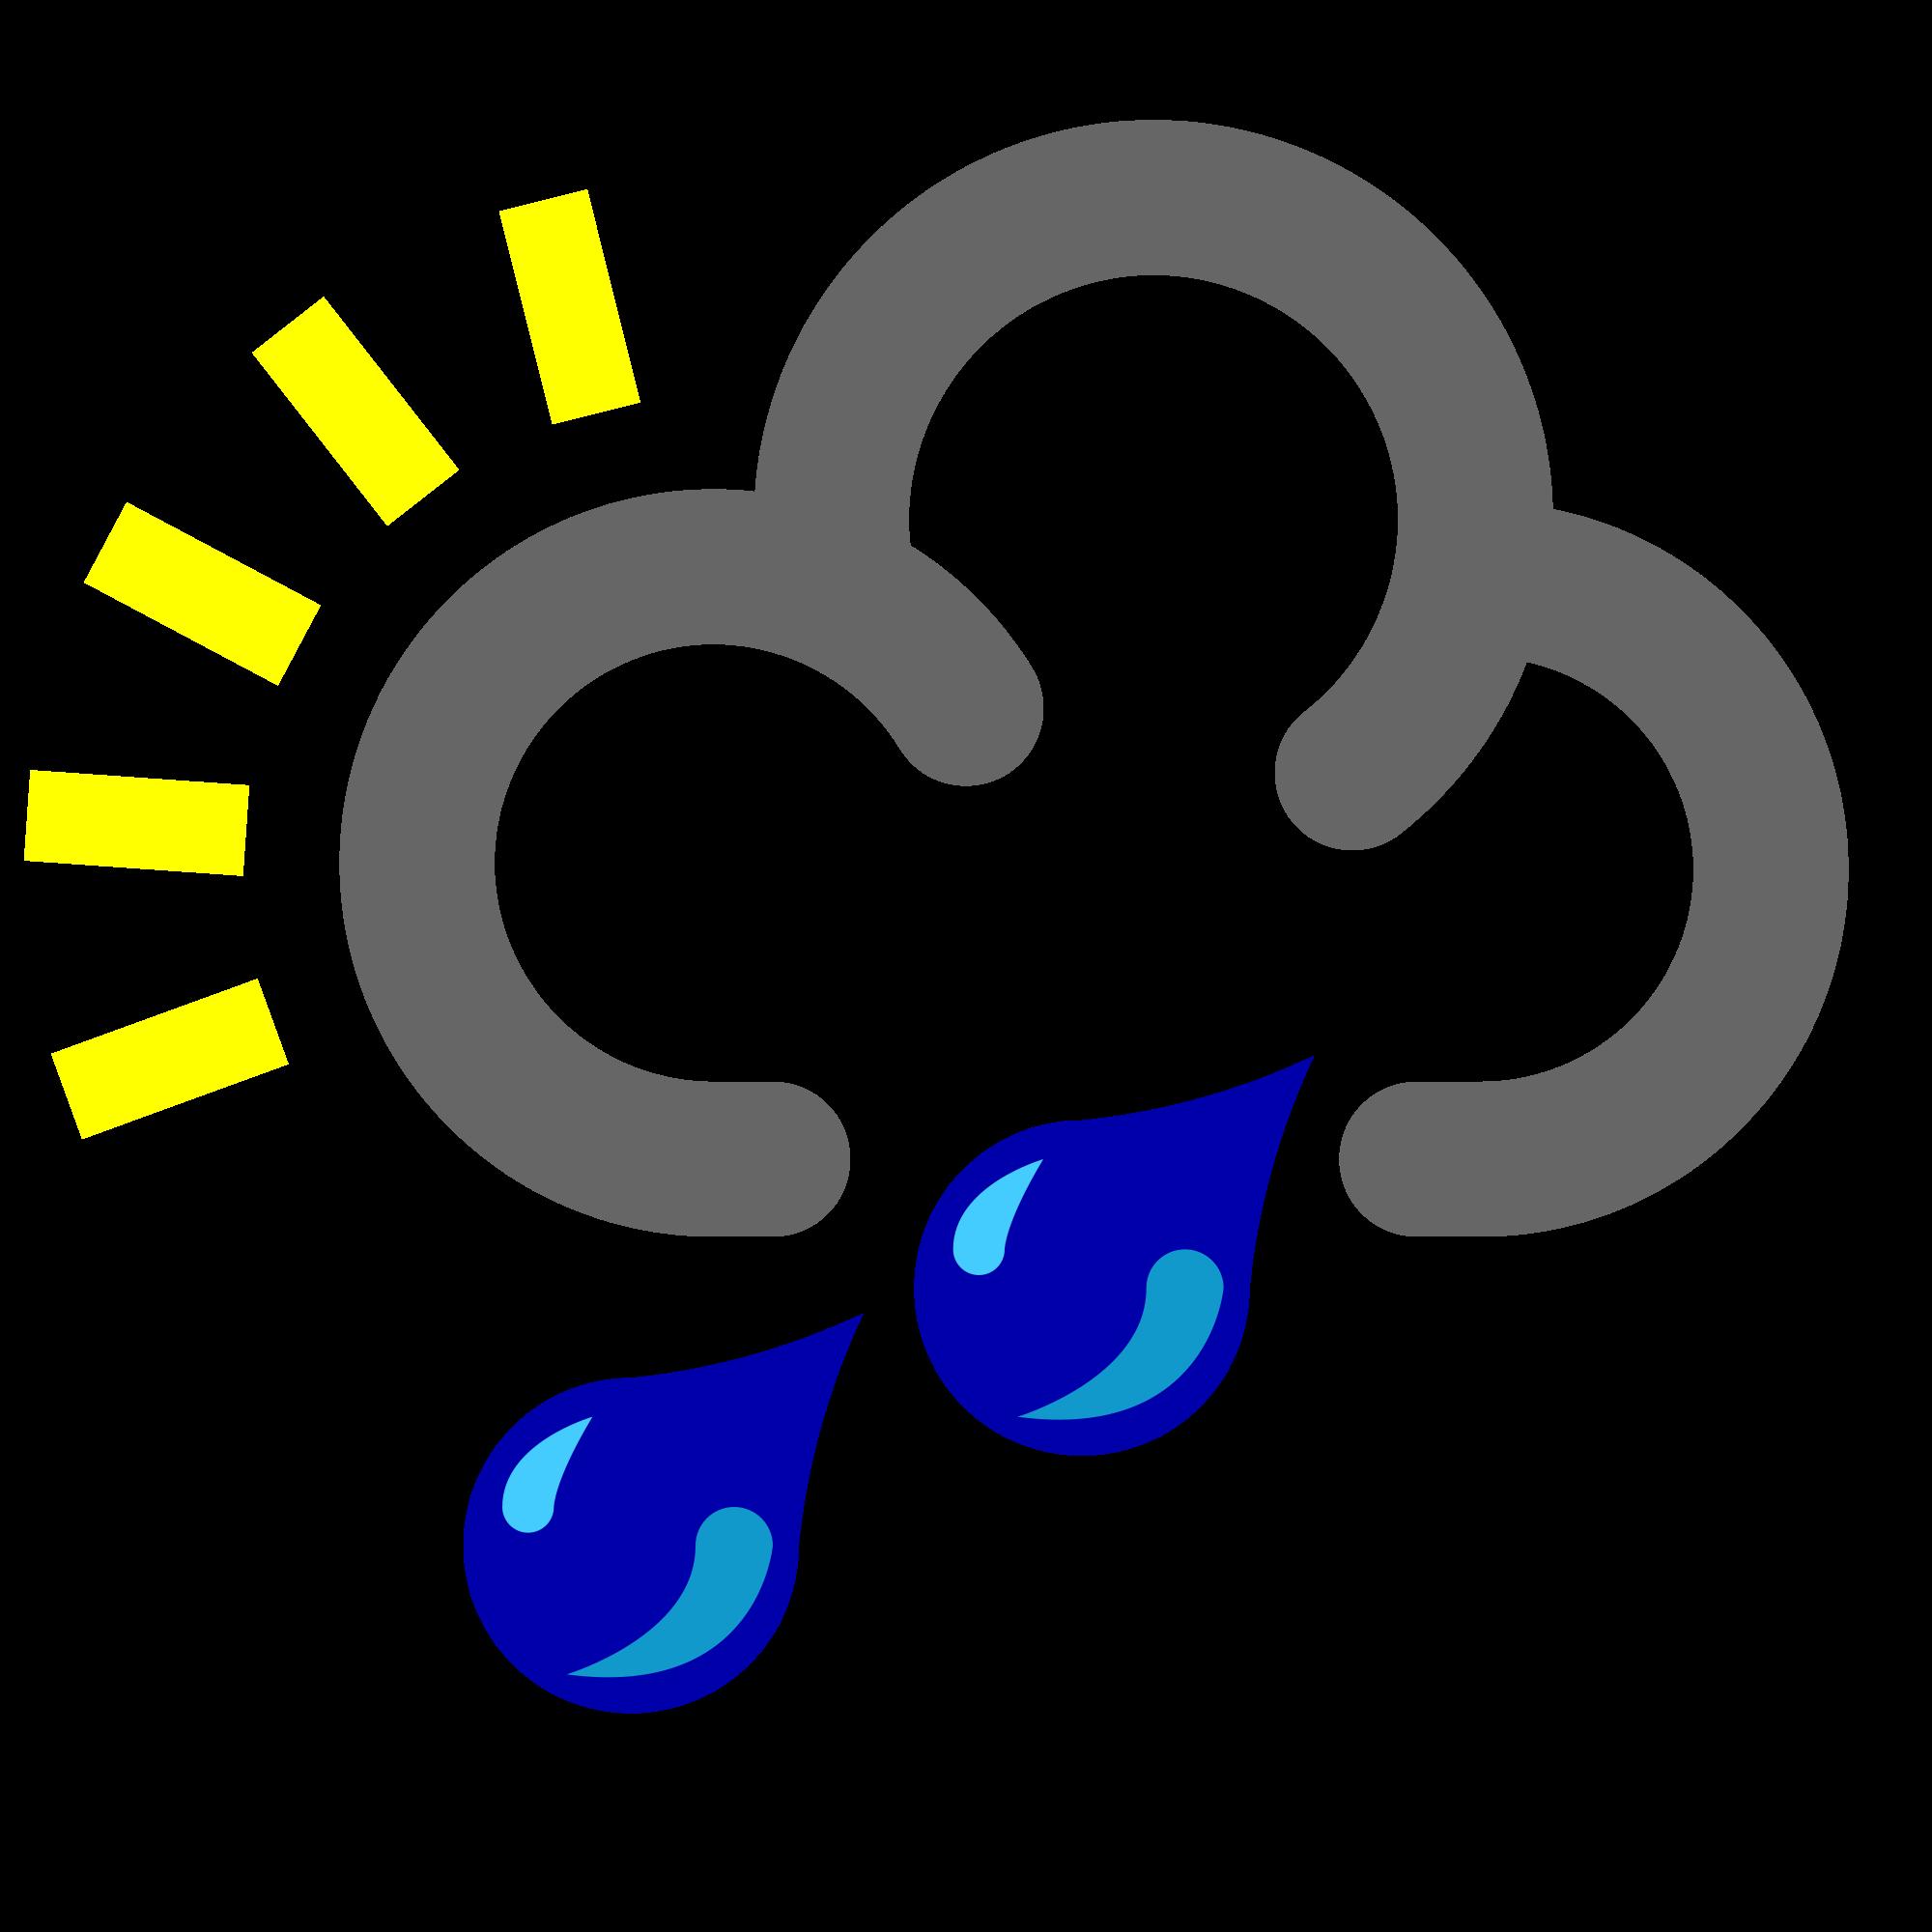 File rain shower transparent. Raindrop clipart heavy rainfall